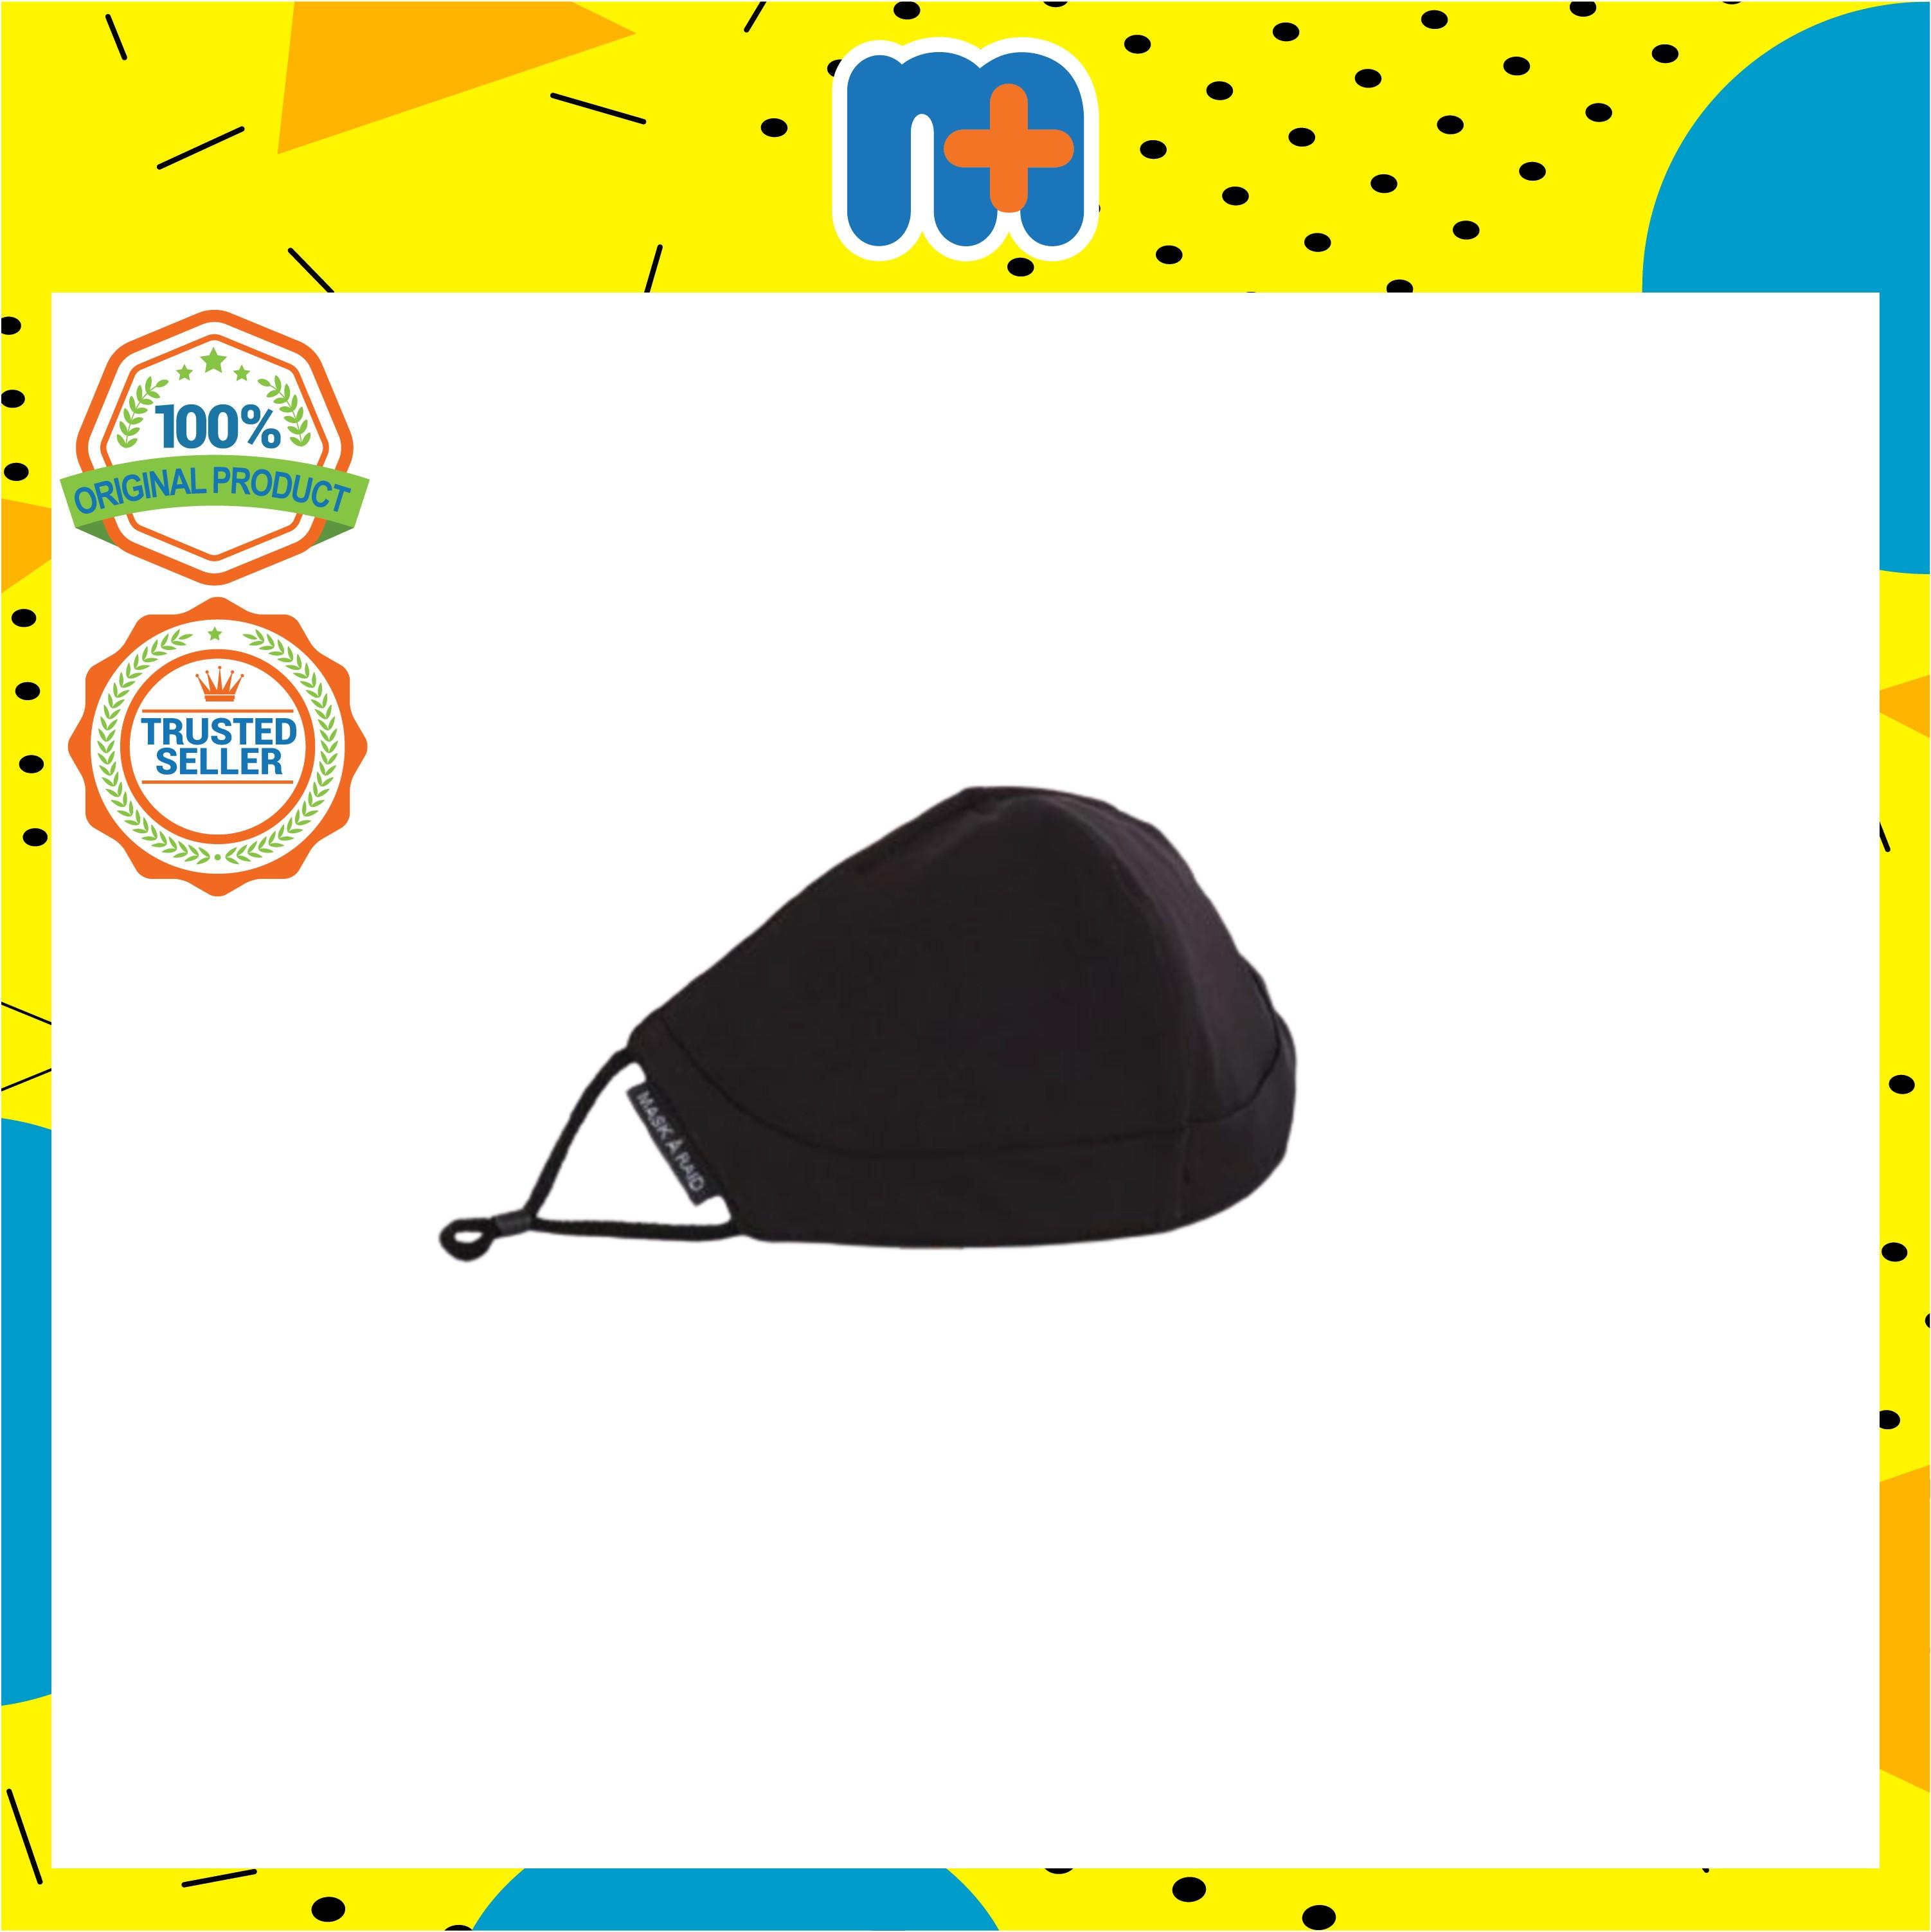 [MPLUS] MASKARAID Jet Black Adults Structured 3 PLY Reusable Fabric Mask